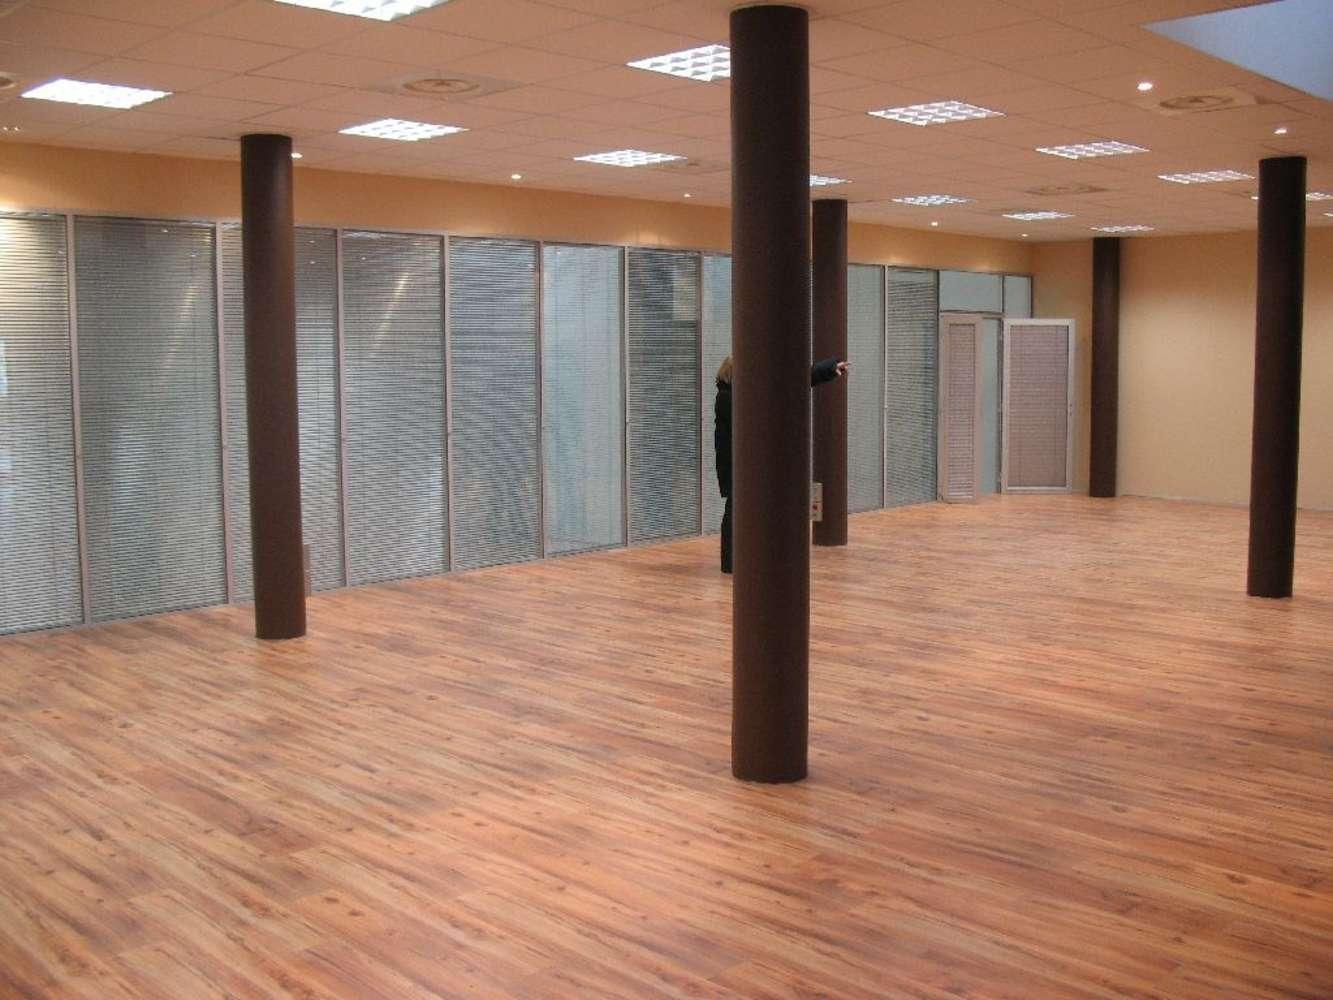 Activités/entrepôt Limonest, 69760 - Location bâtiment mixte TECHLID (Lyon) - 9988866